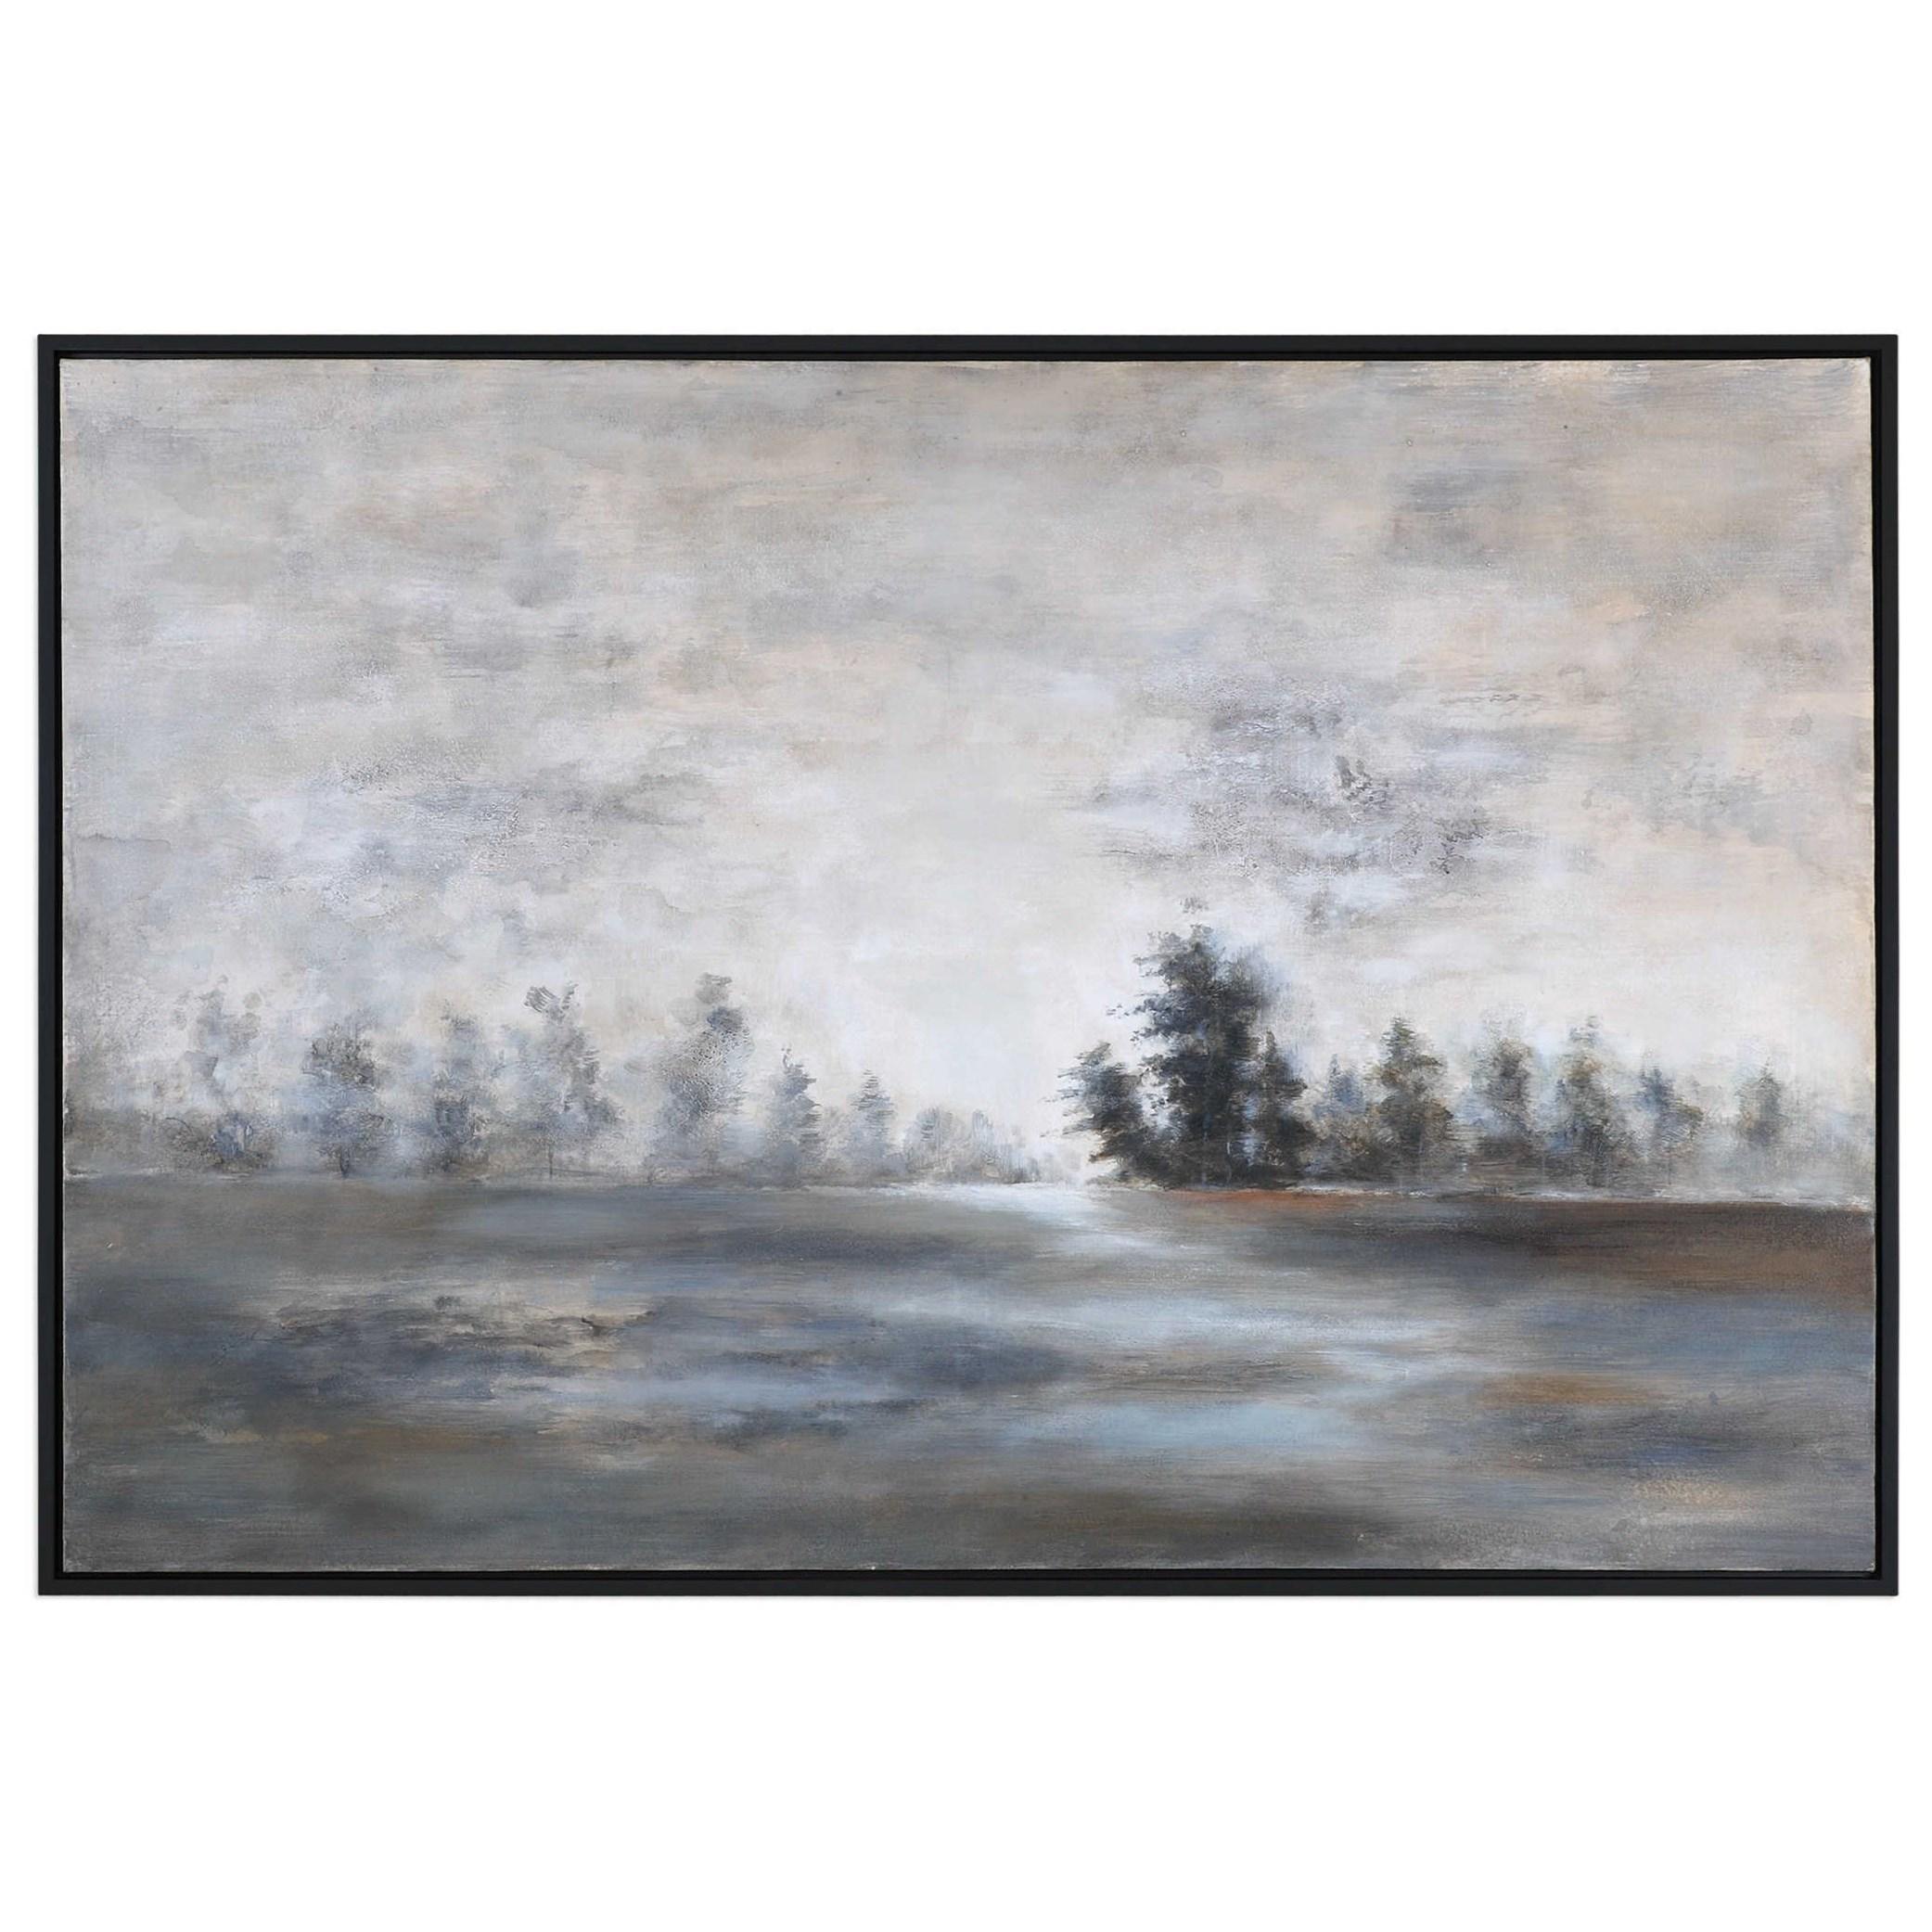 Art Evening Mist Landscape Art by Uttermost at Mueller Furniture